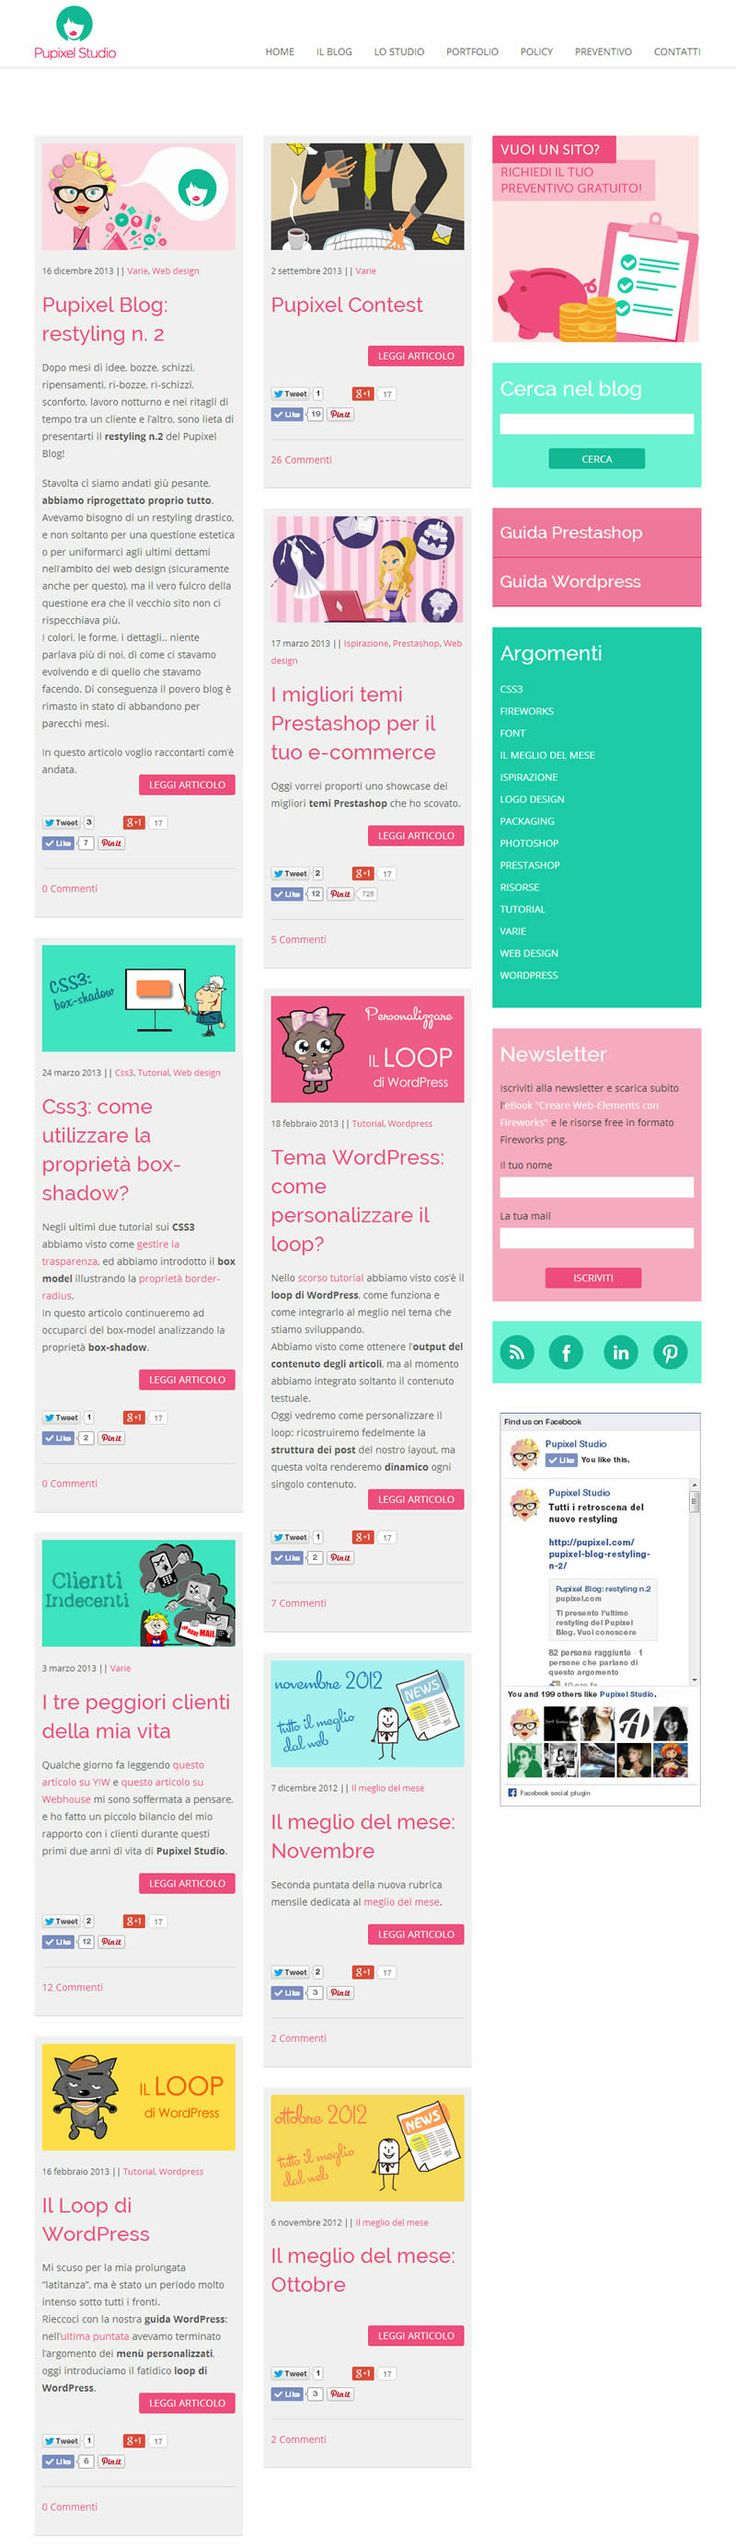 Pupixel Blog #restyling #blog #flat #design #responsive